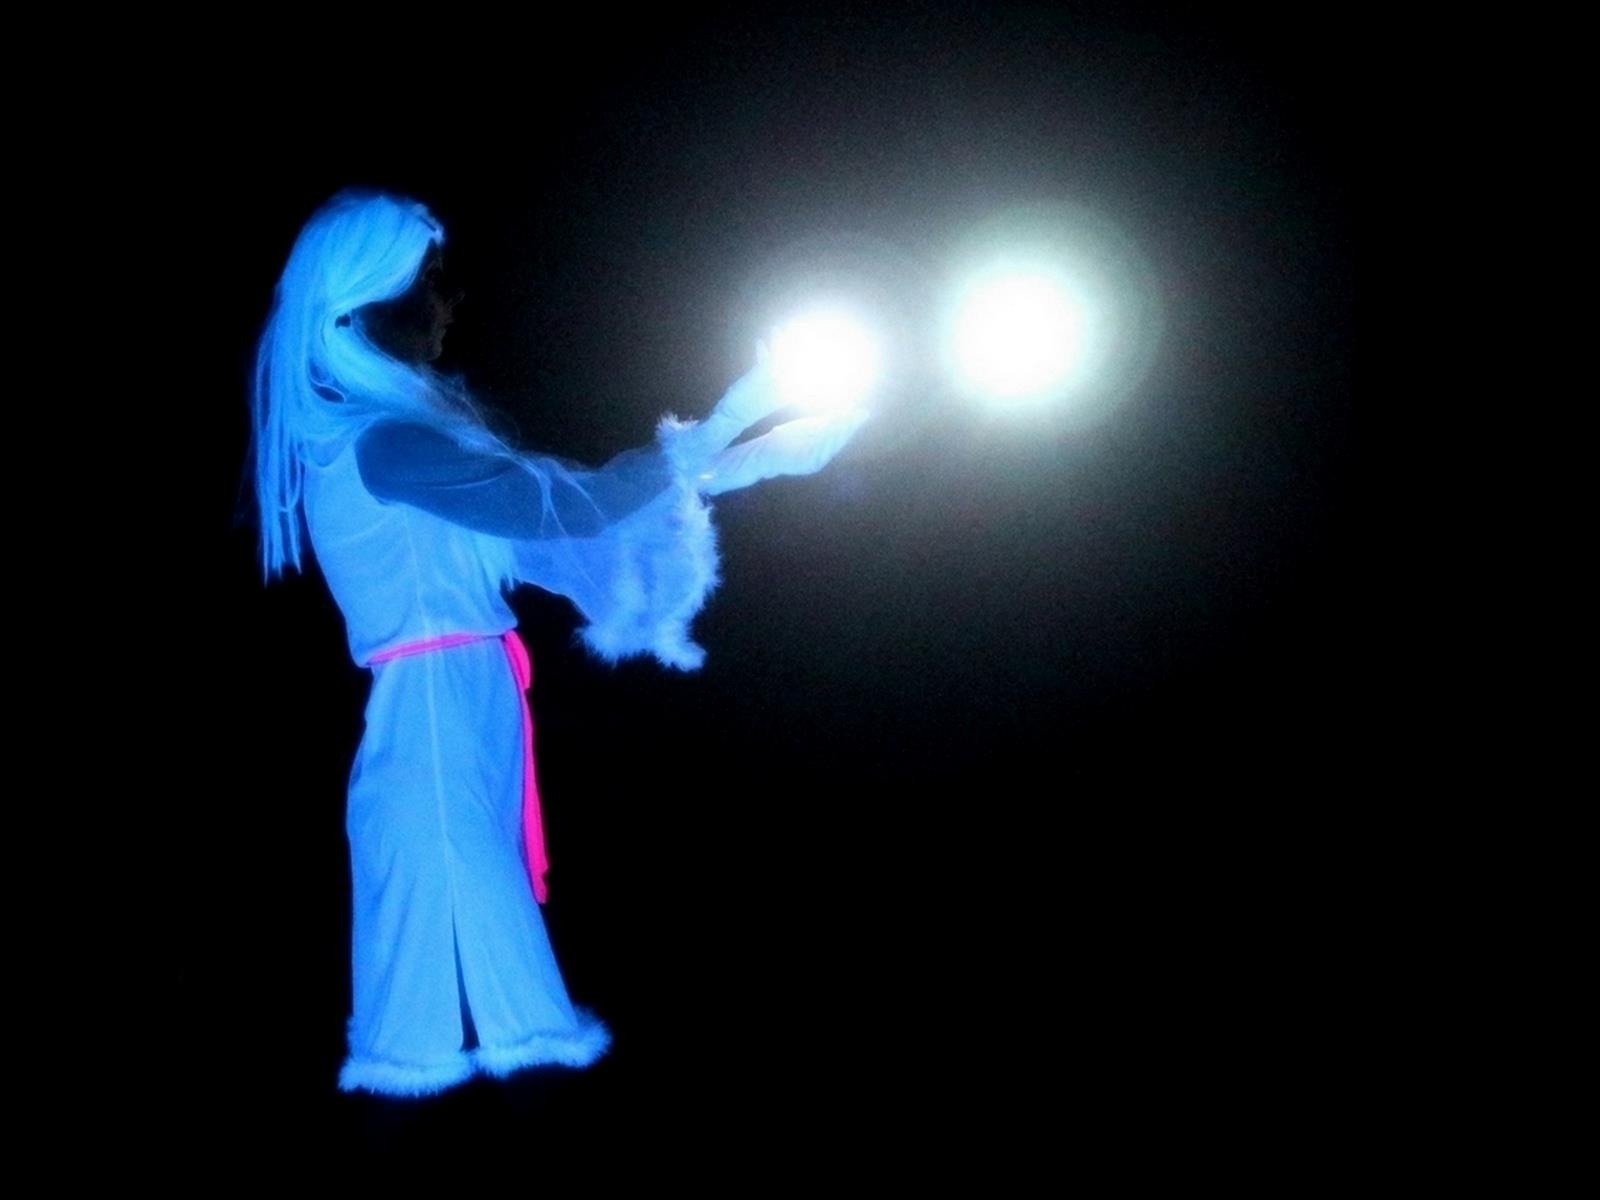 Magic Phantom, espectáculo de teatro de luz negra